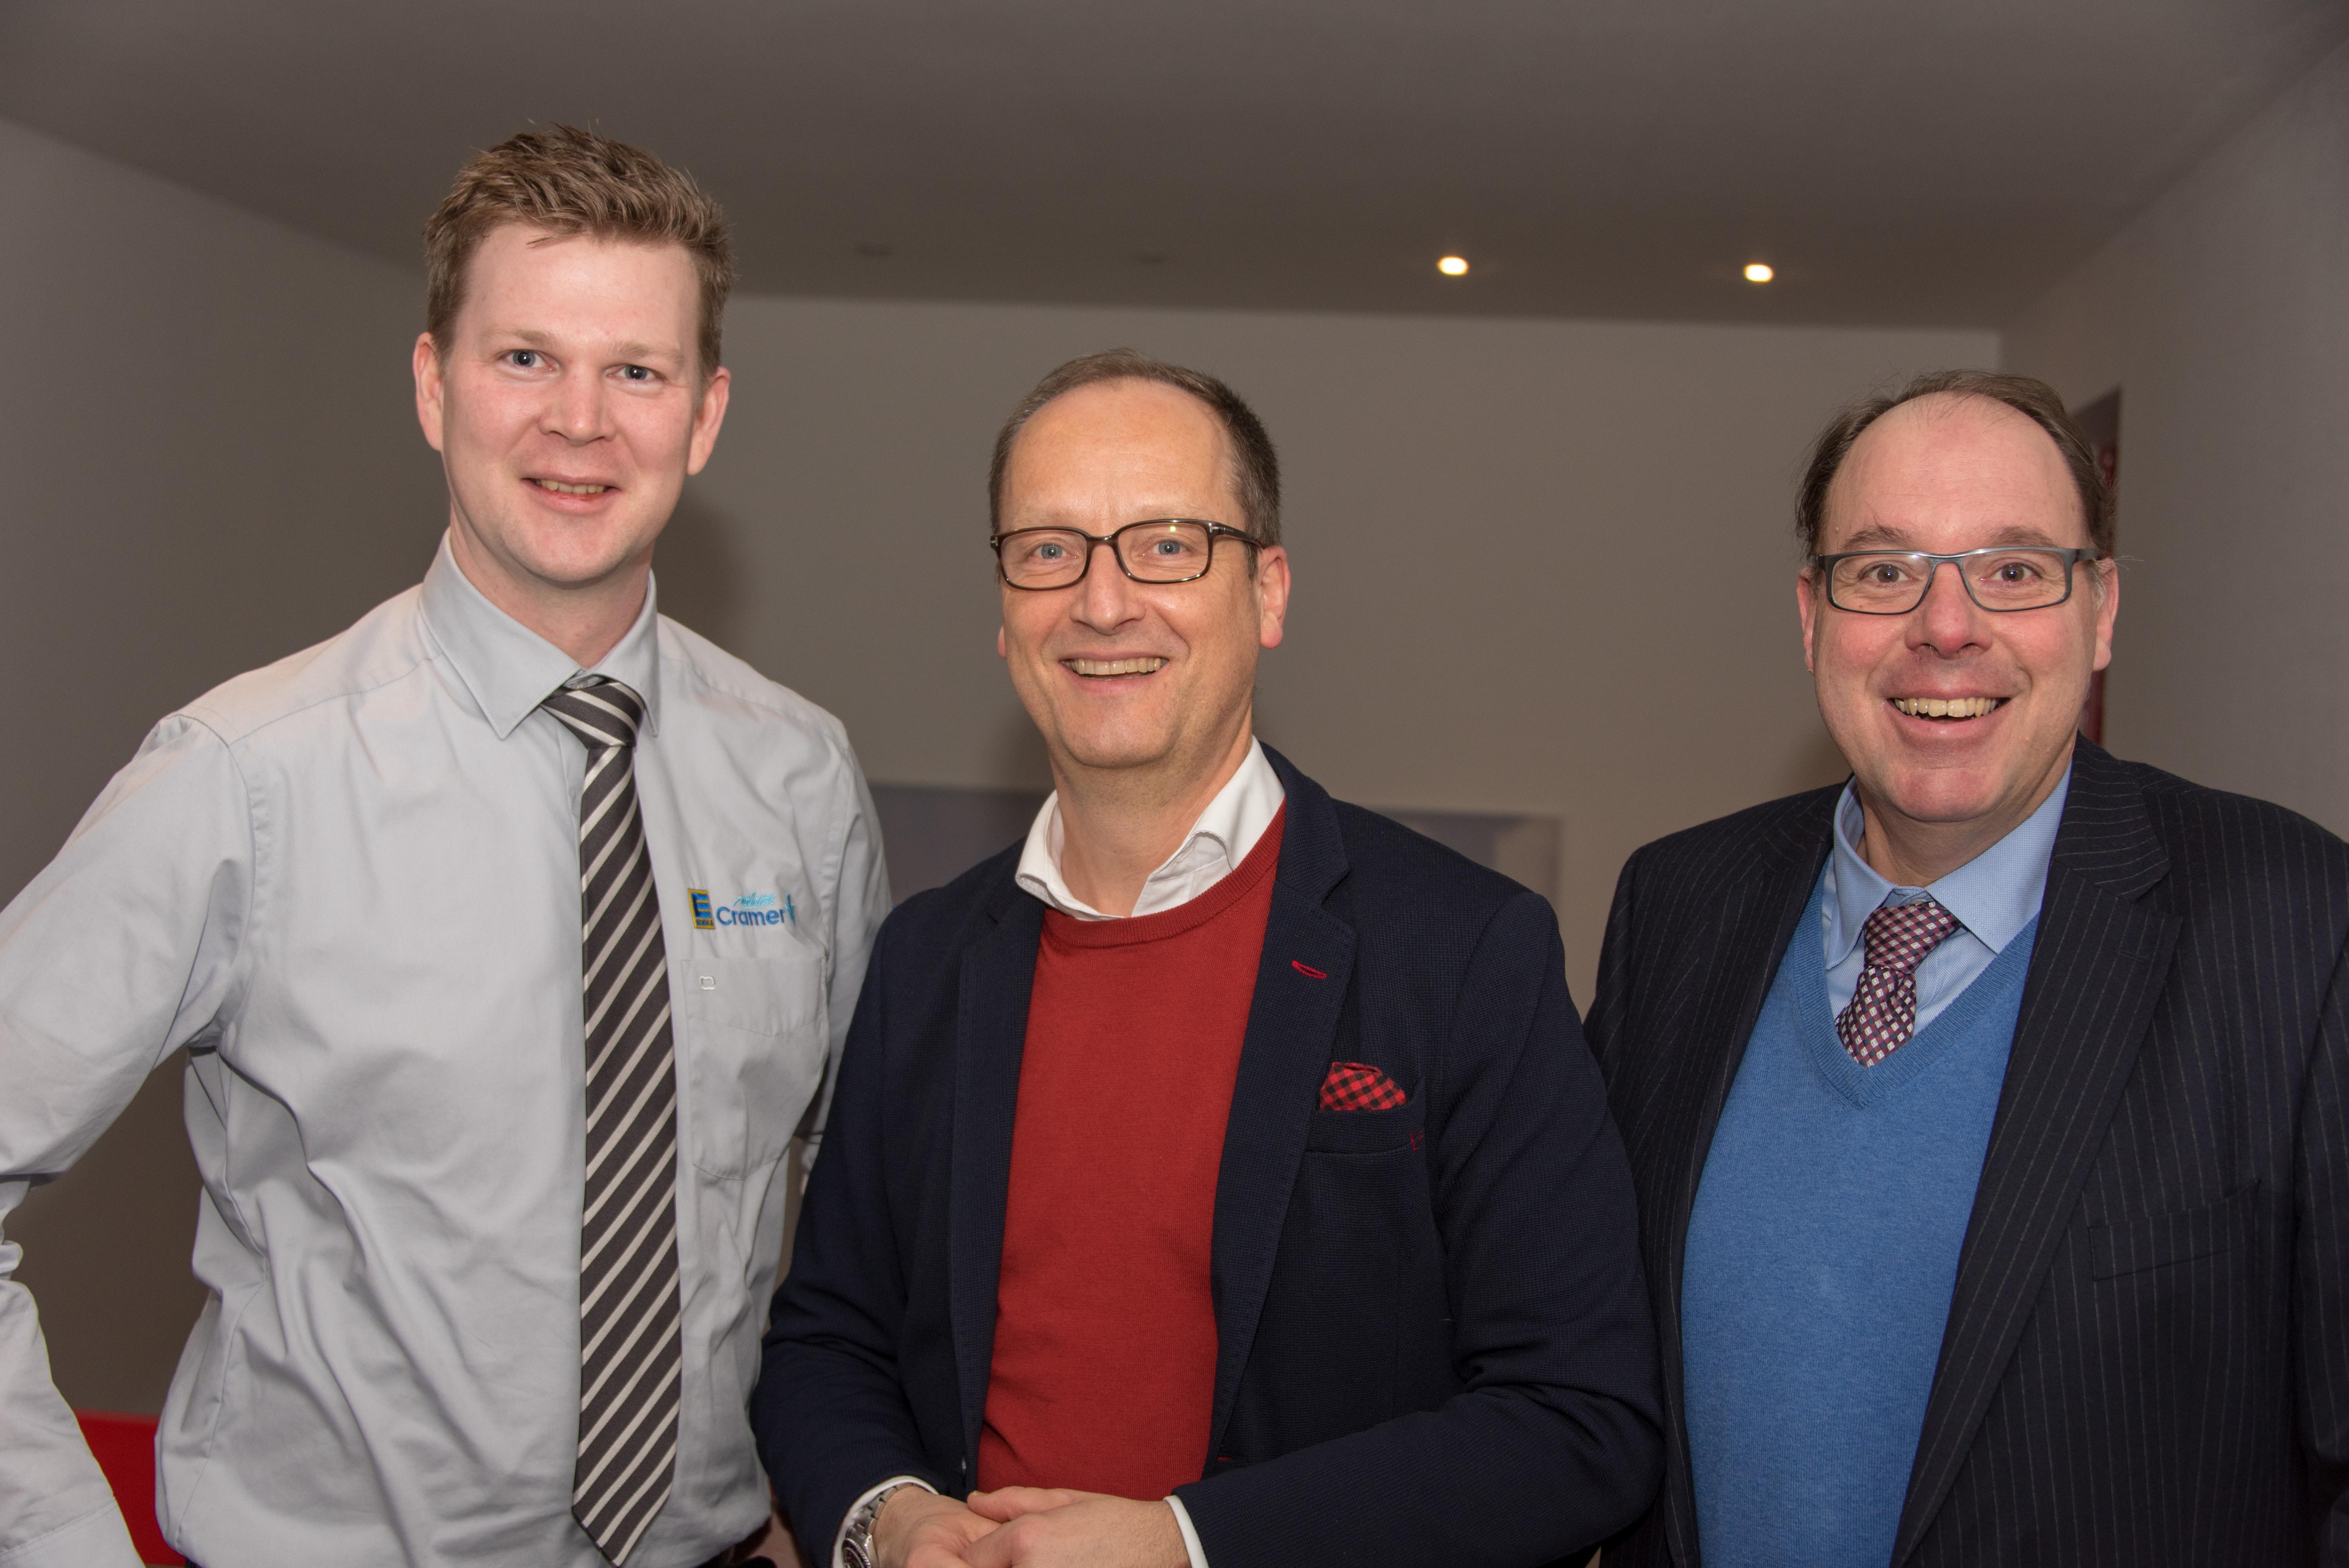 Sebastian Cramer, Christoph Ludwig, Gregor Schneider